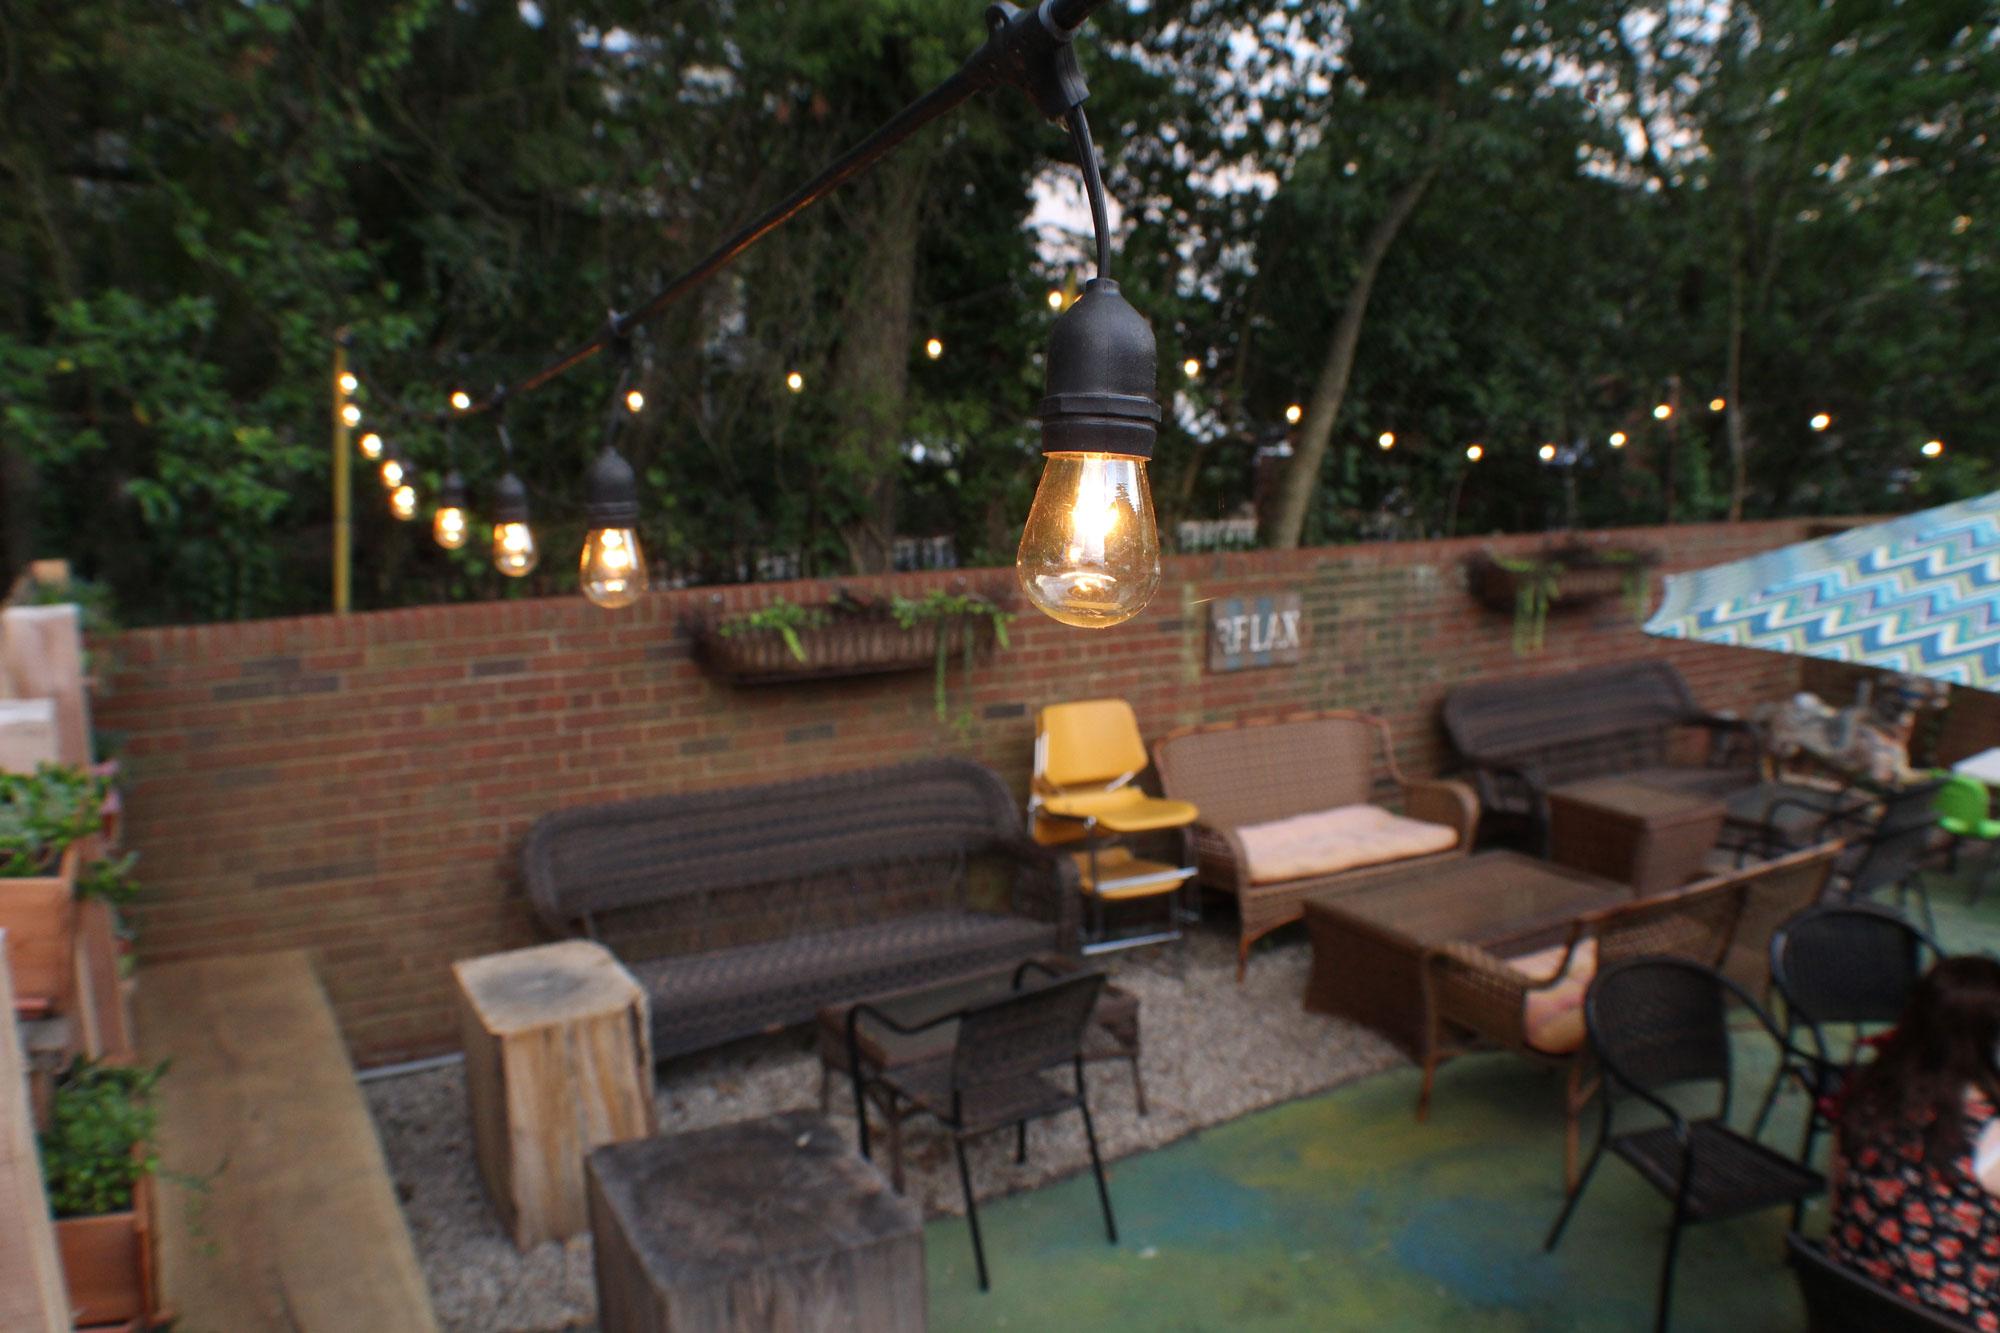 pasta_provisions_park_patio_lightbulb.jpg